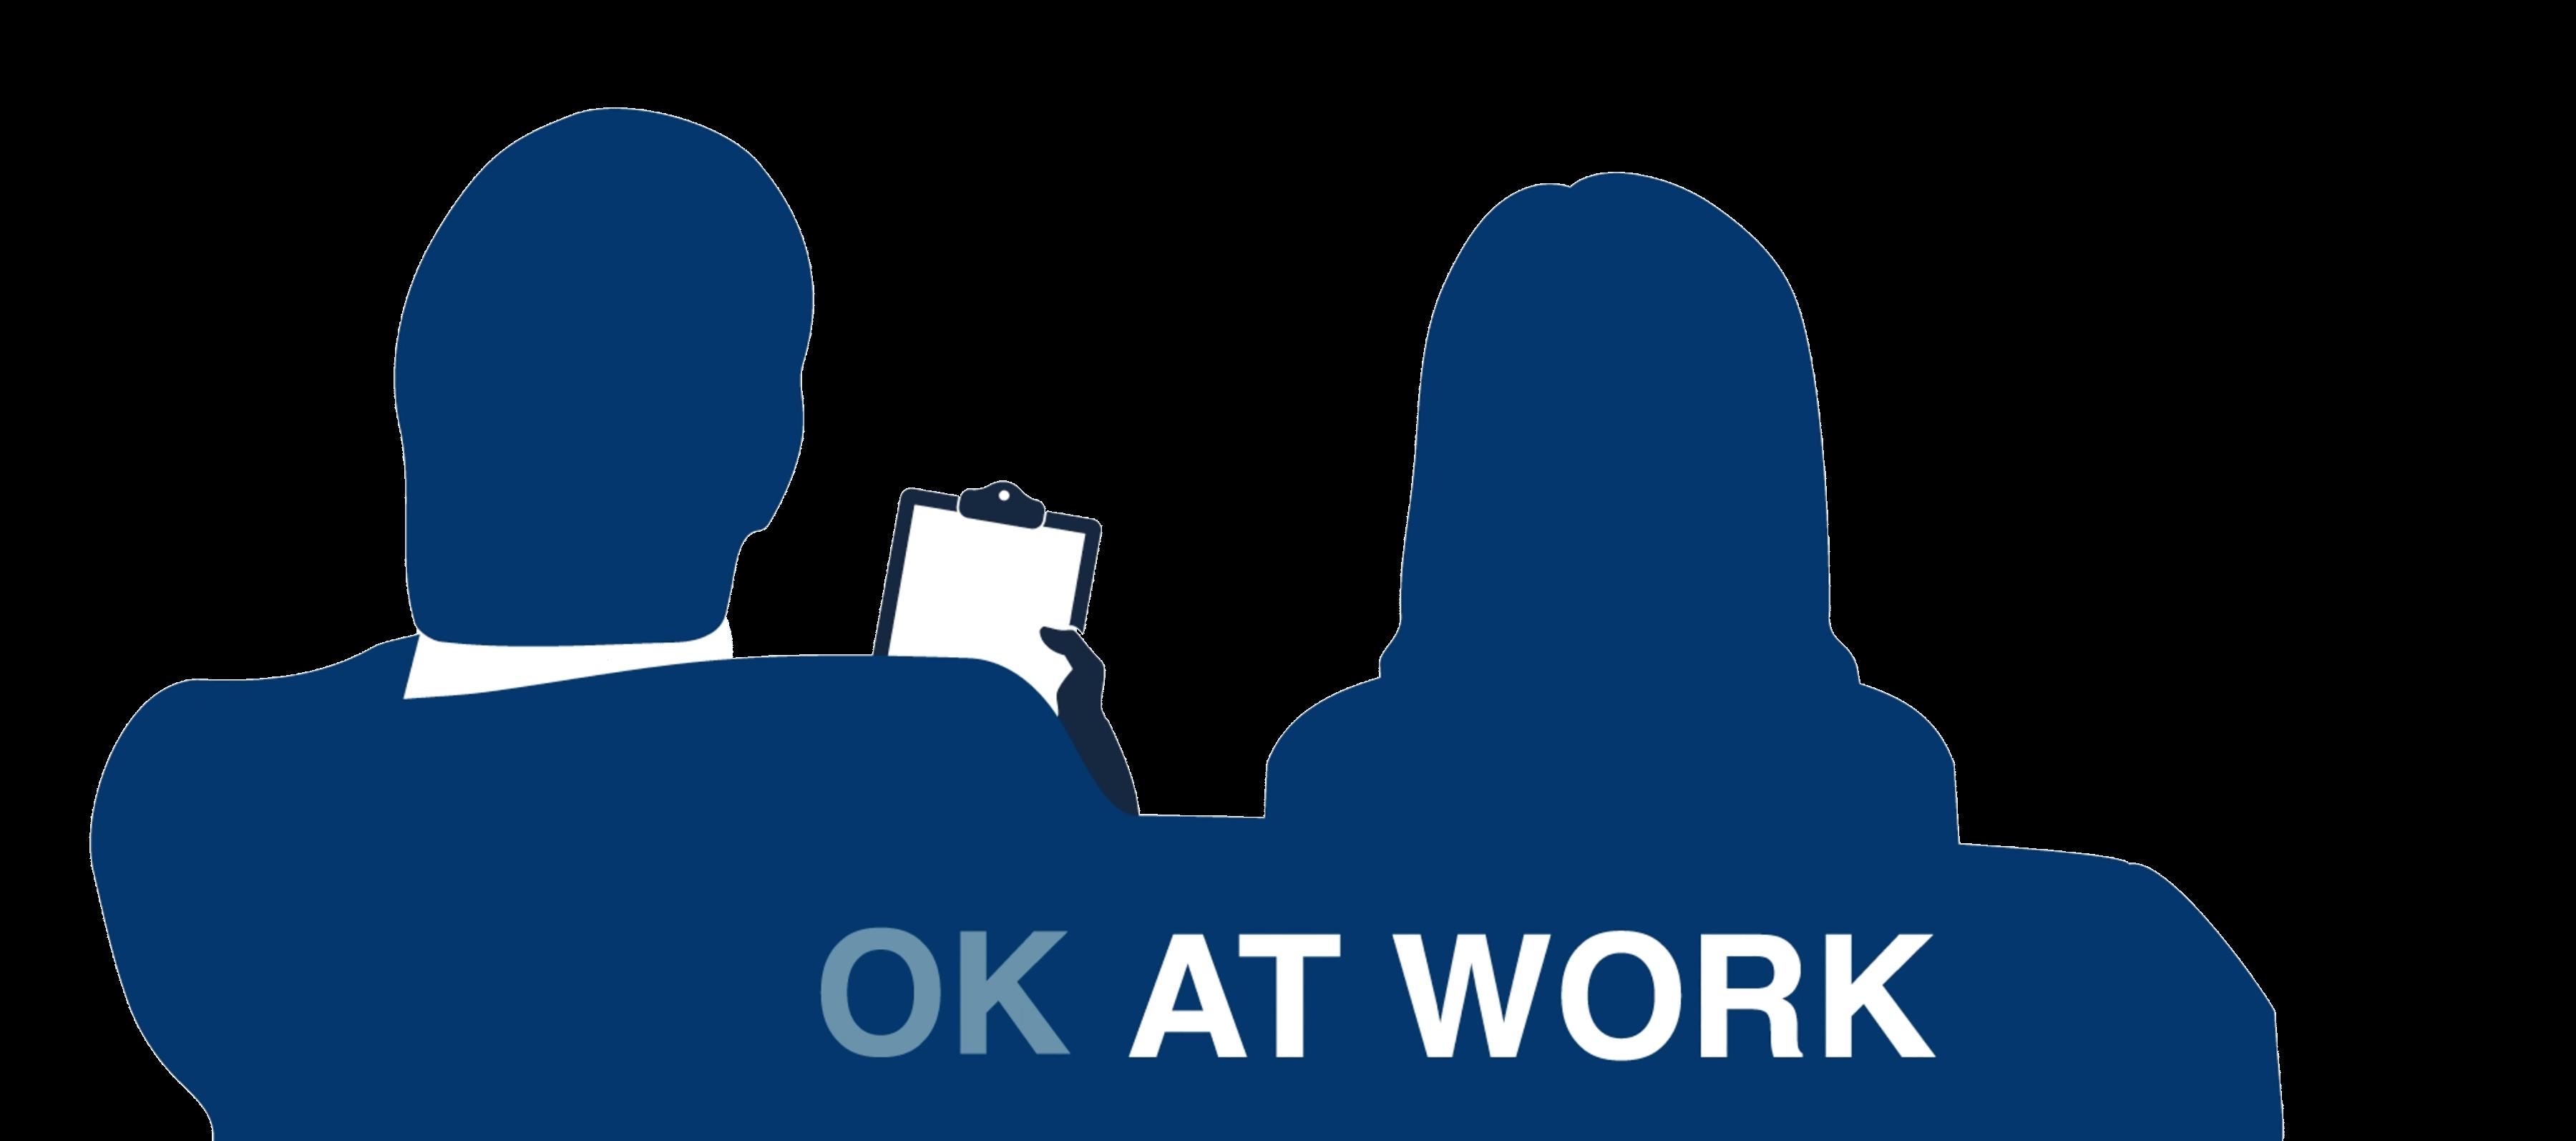 OK at Work_2-transparent-lrg